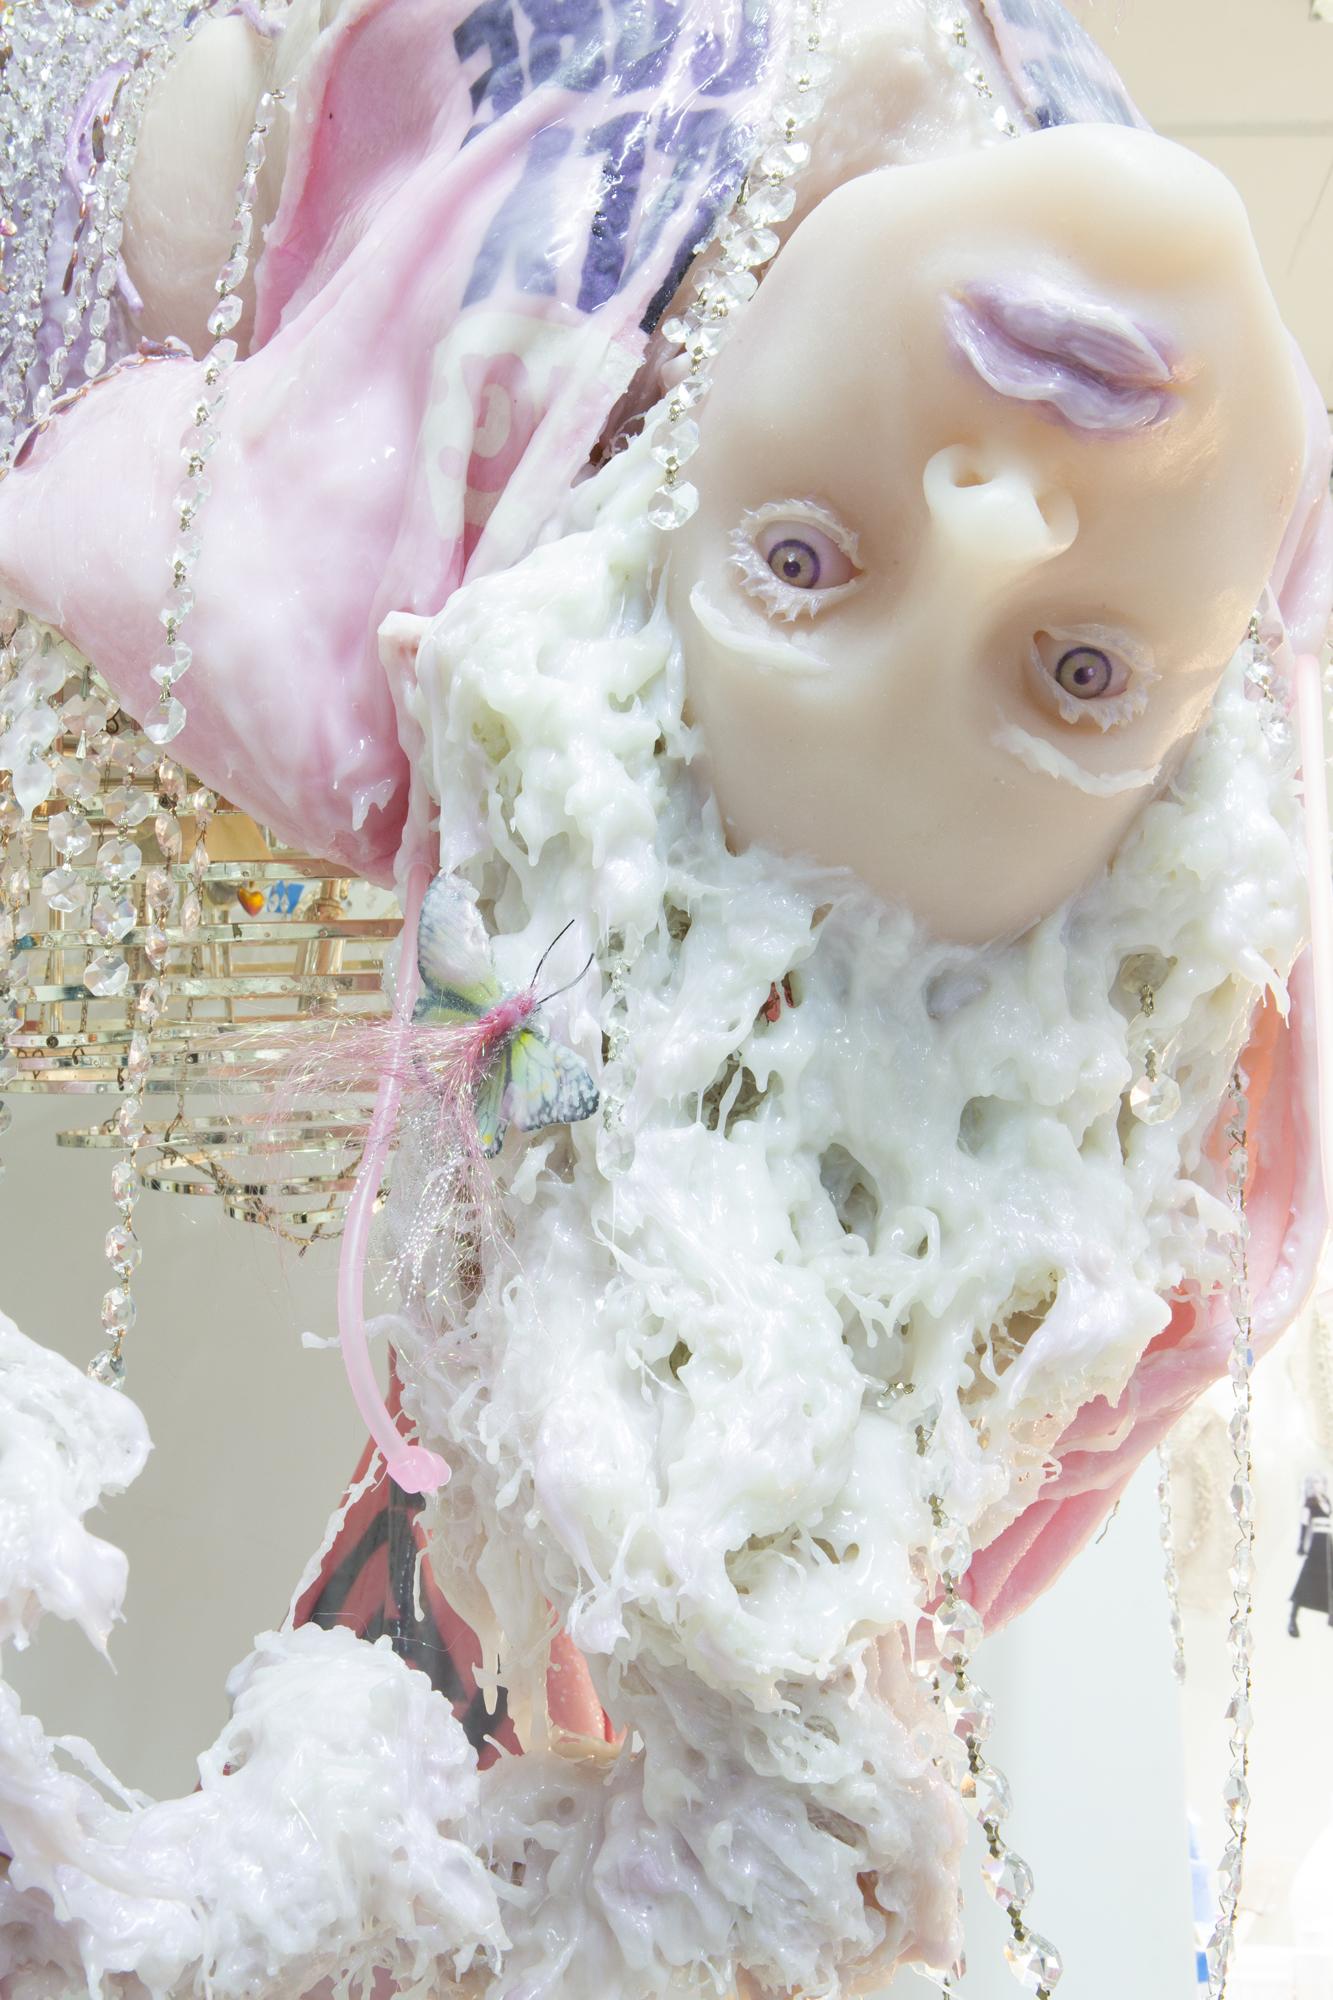 Cajsa von Zeipel   Butterfly Effect  2019 Chandelier, silicone, aqua resin, foam spray, fabric, bead curtains, sand, glitter 140 x 142 x 134.5 cm